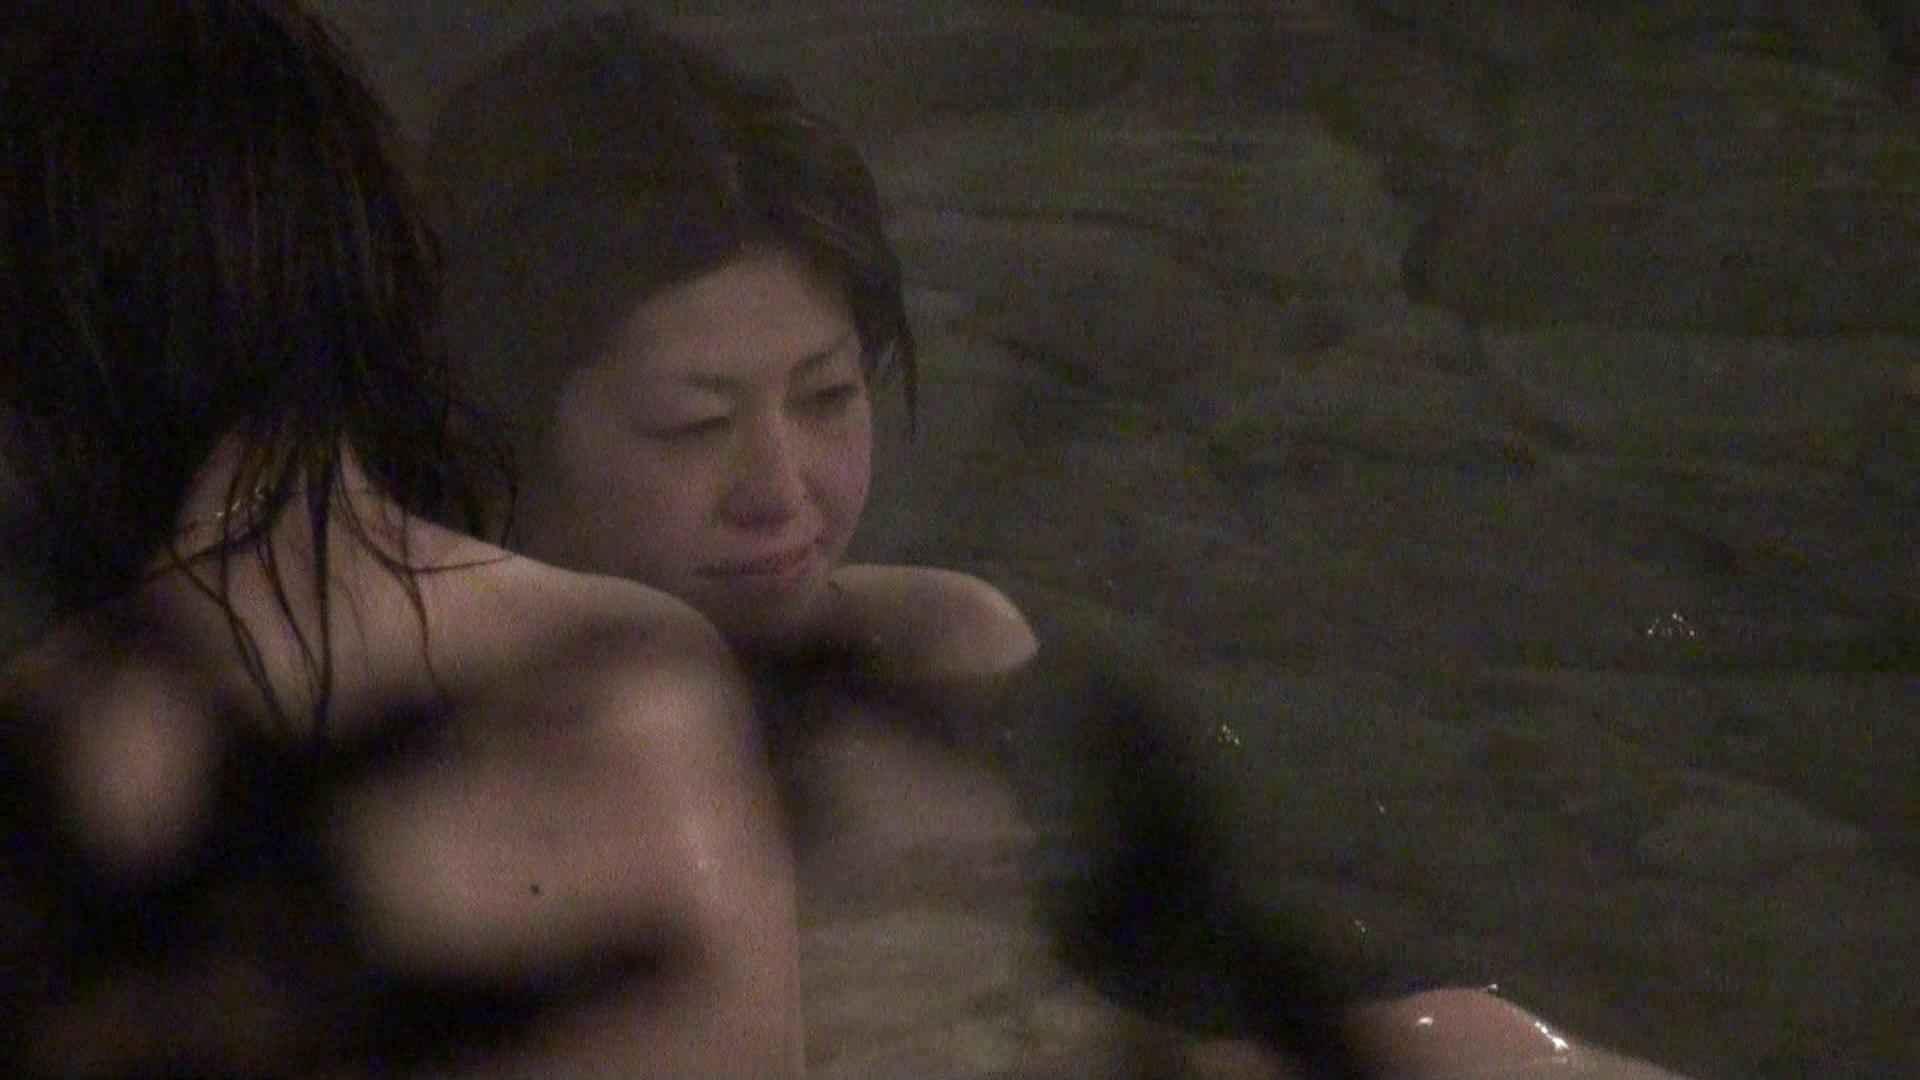 Aquaな露天風呂Vol.376 盗撮 おまんこ動画流出 109連発 41